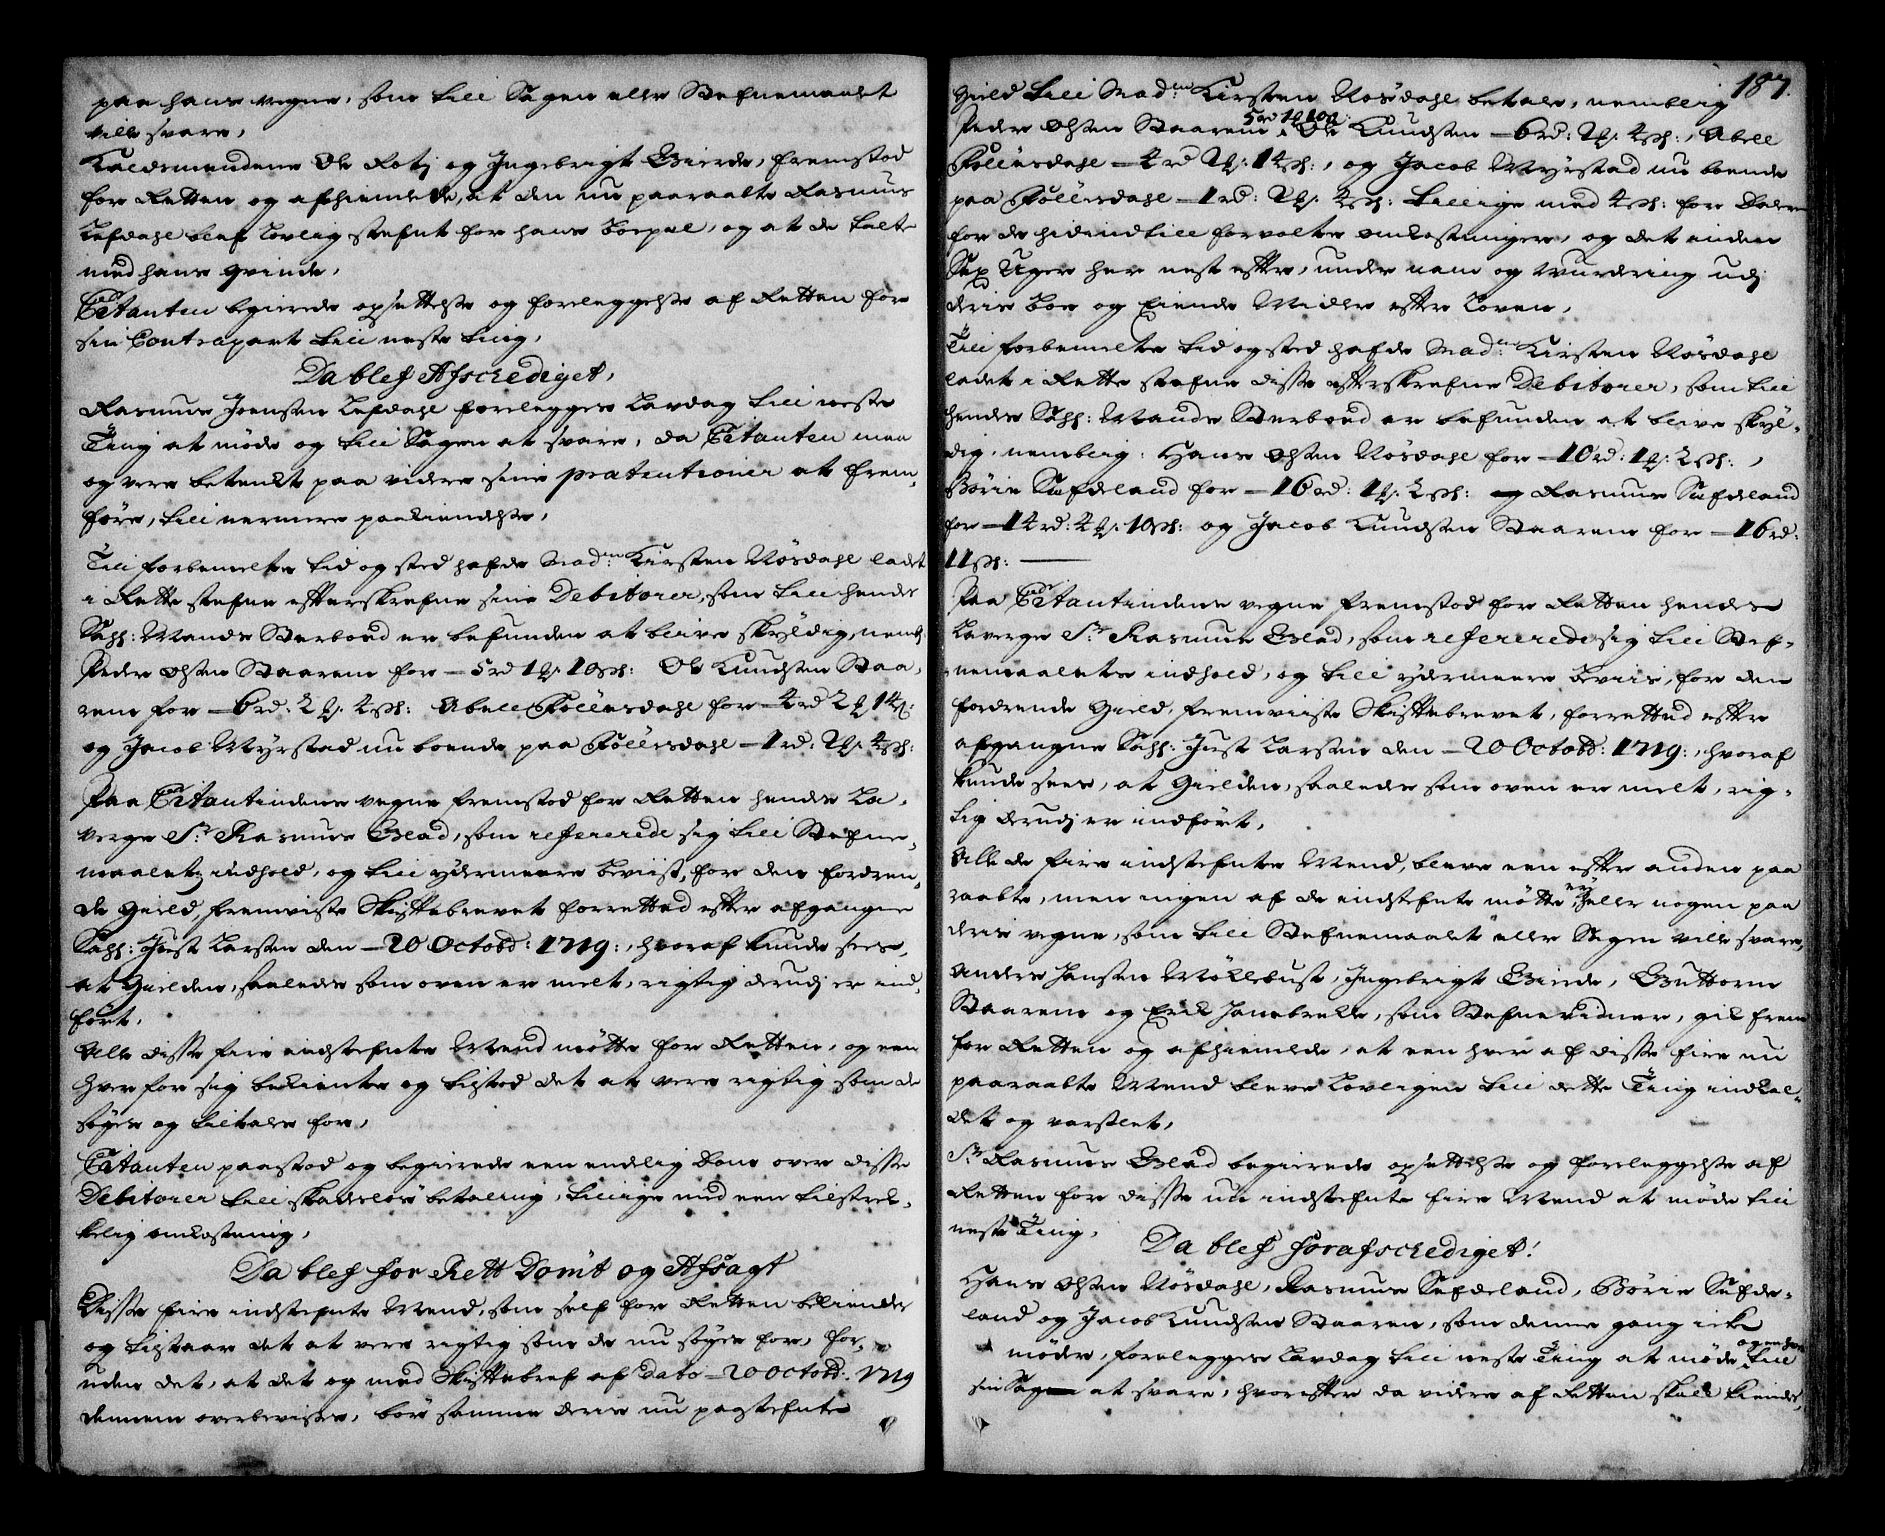 SAB, Nordfjord sorenskriveri, 01/01a/L0020: Tingbøker (justisprotokoller), 1718-1720, s. 186b-187a